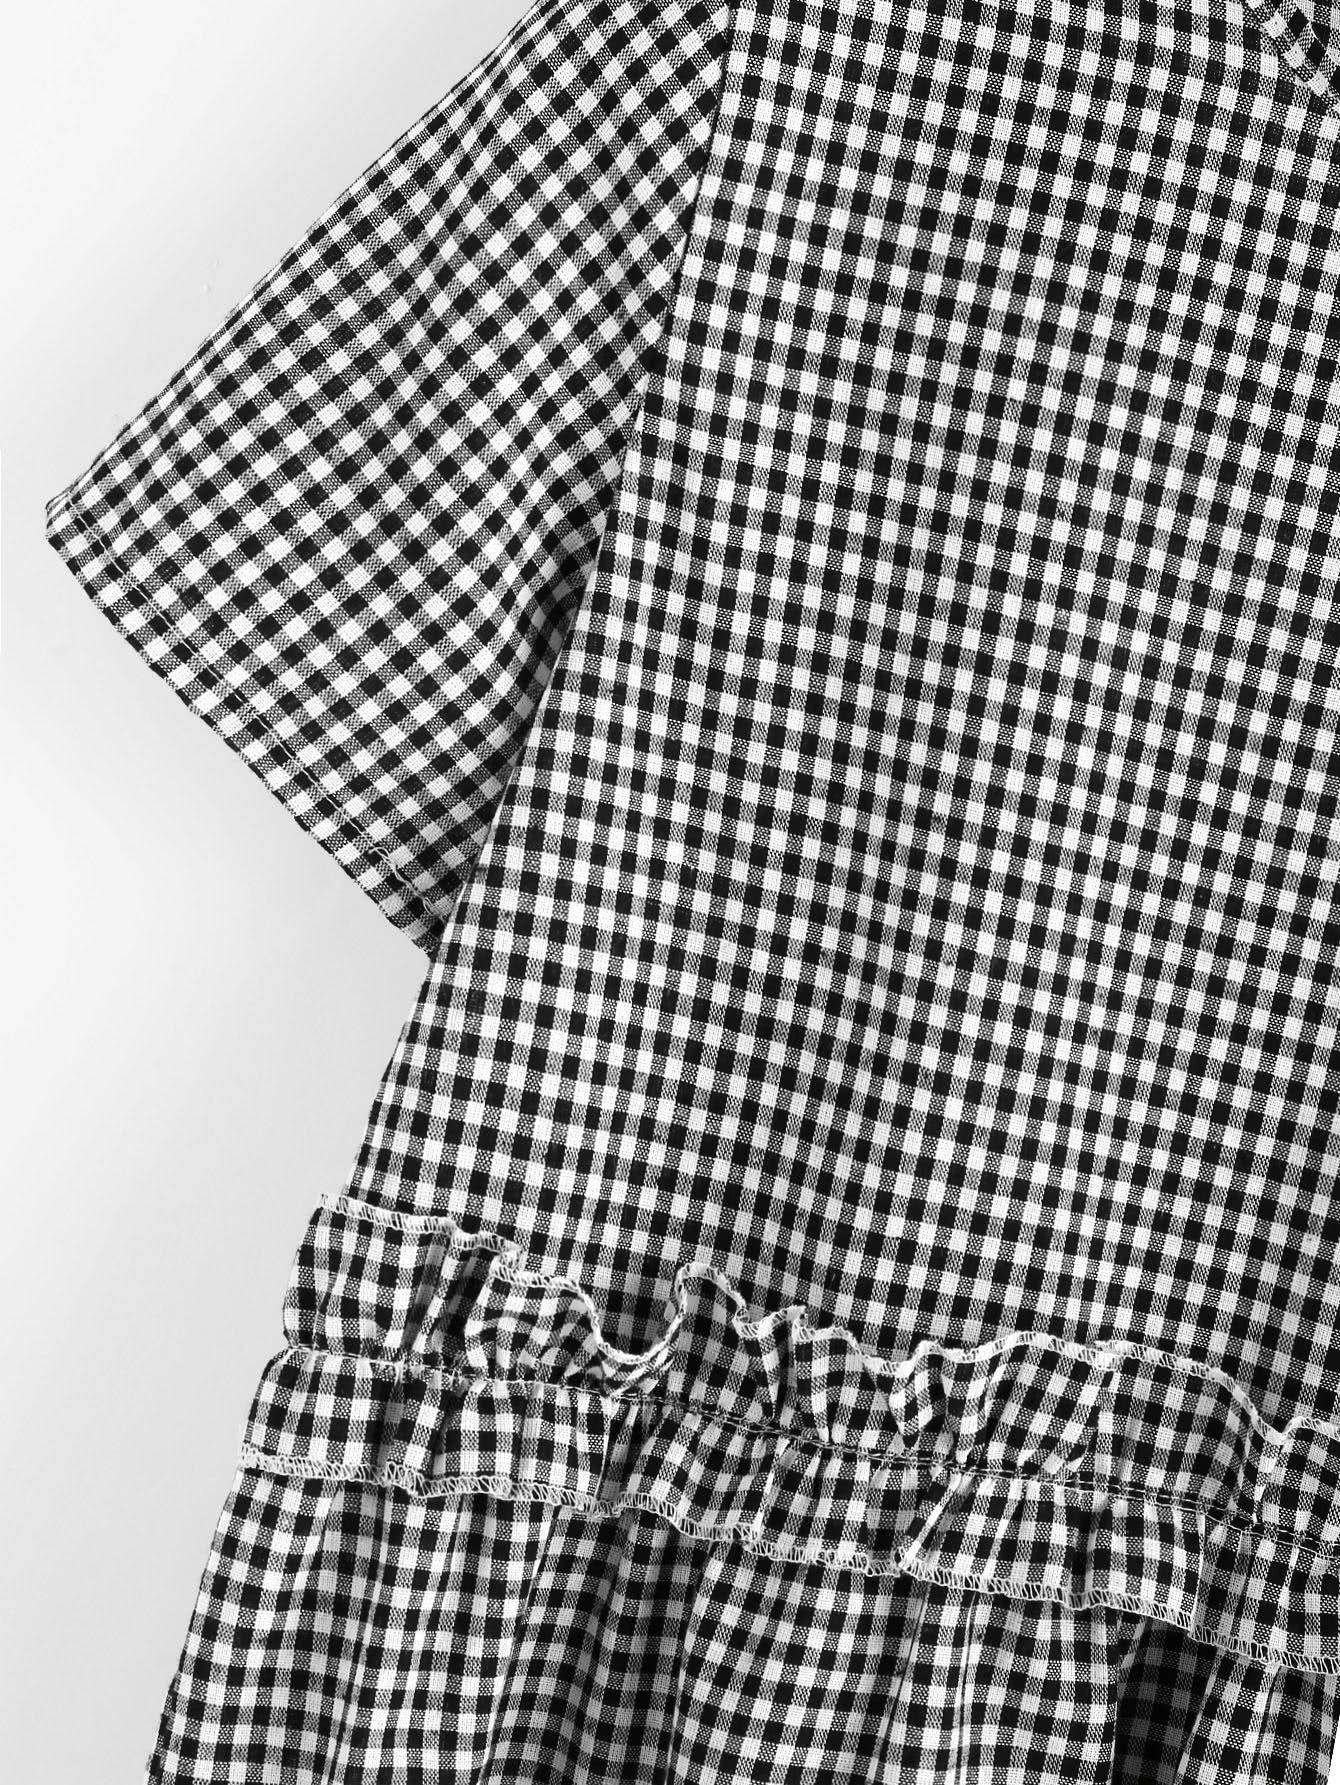 blouse170522108_2